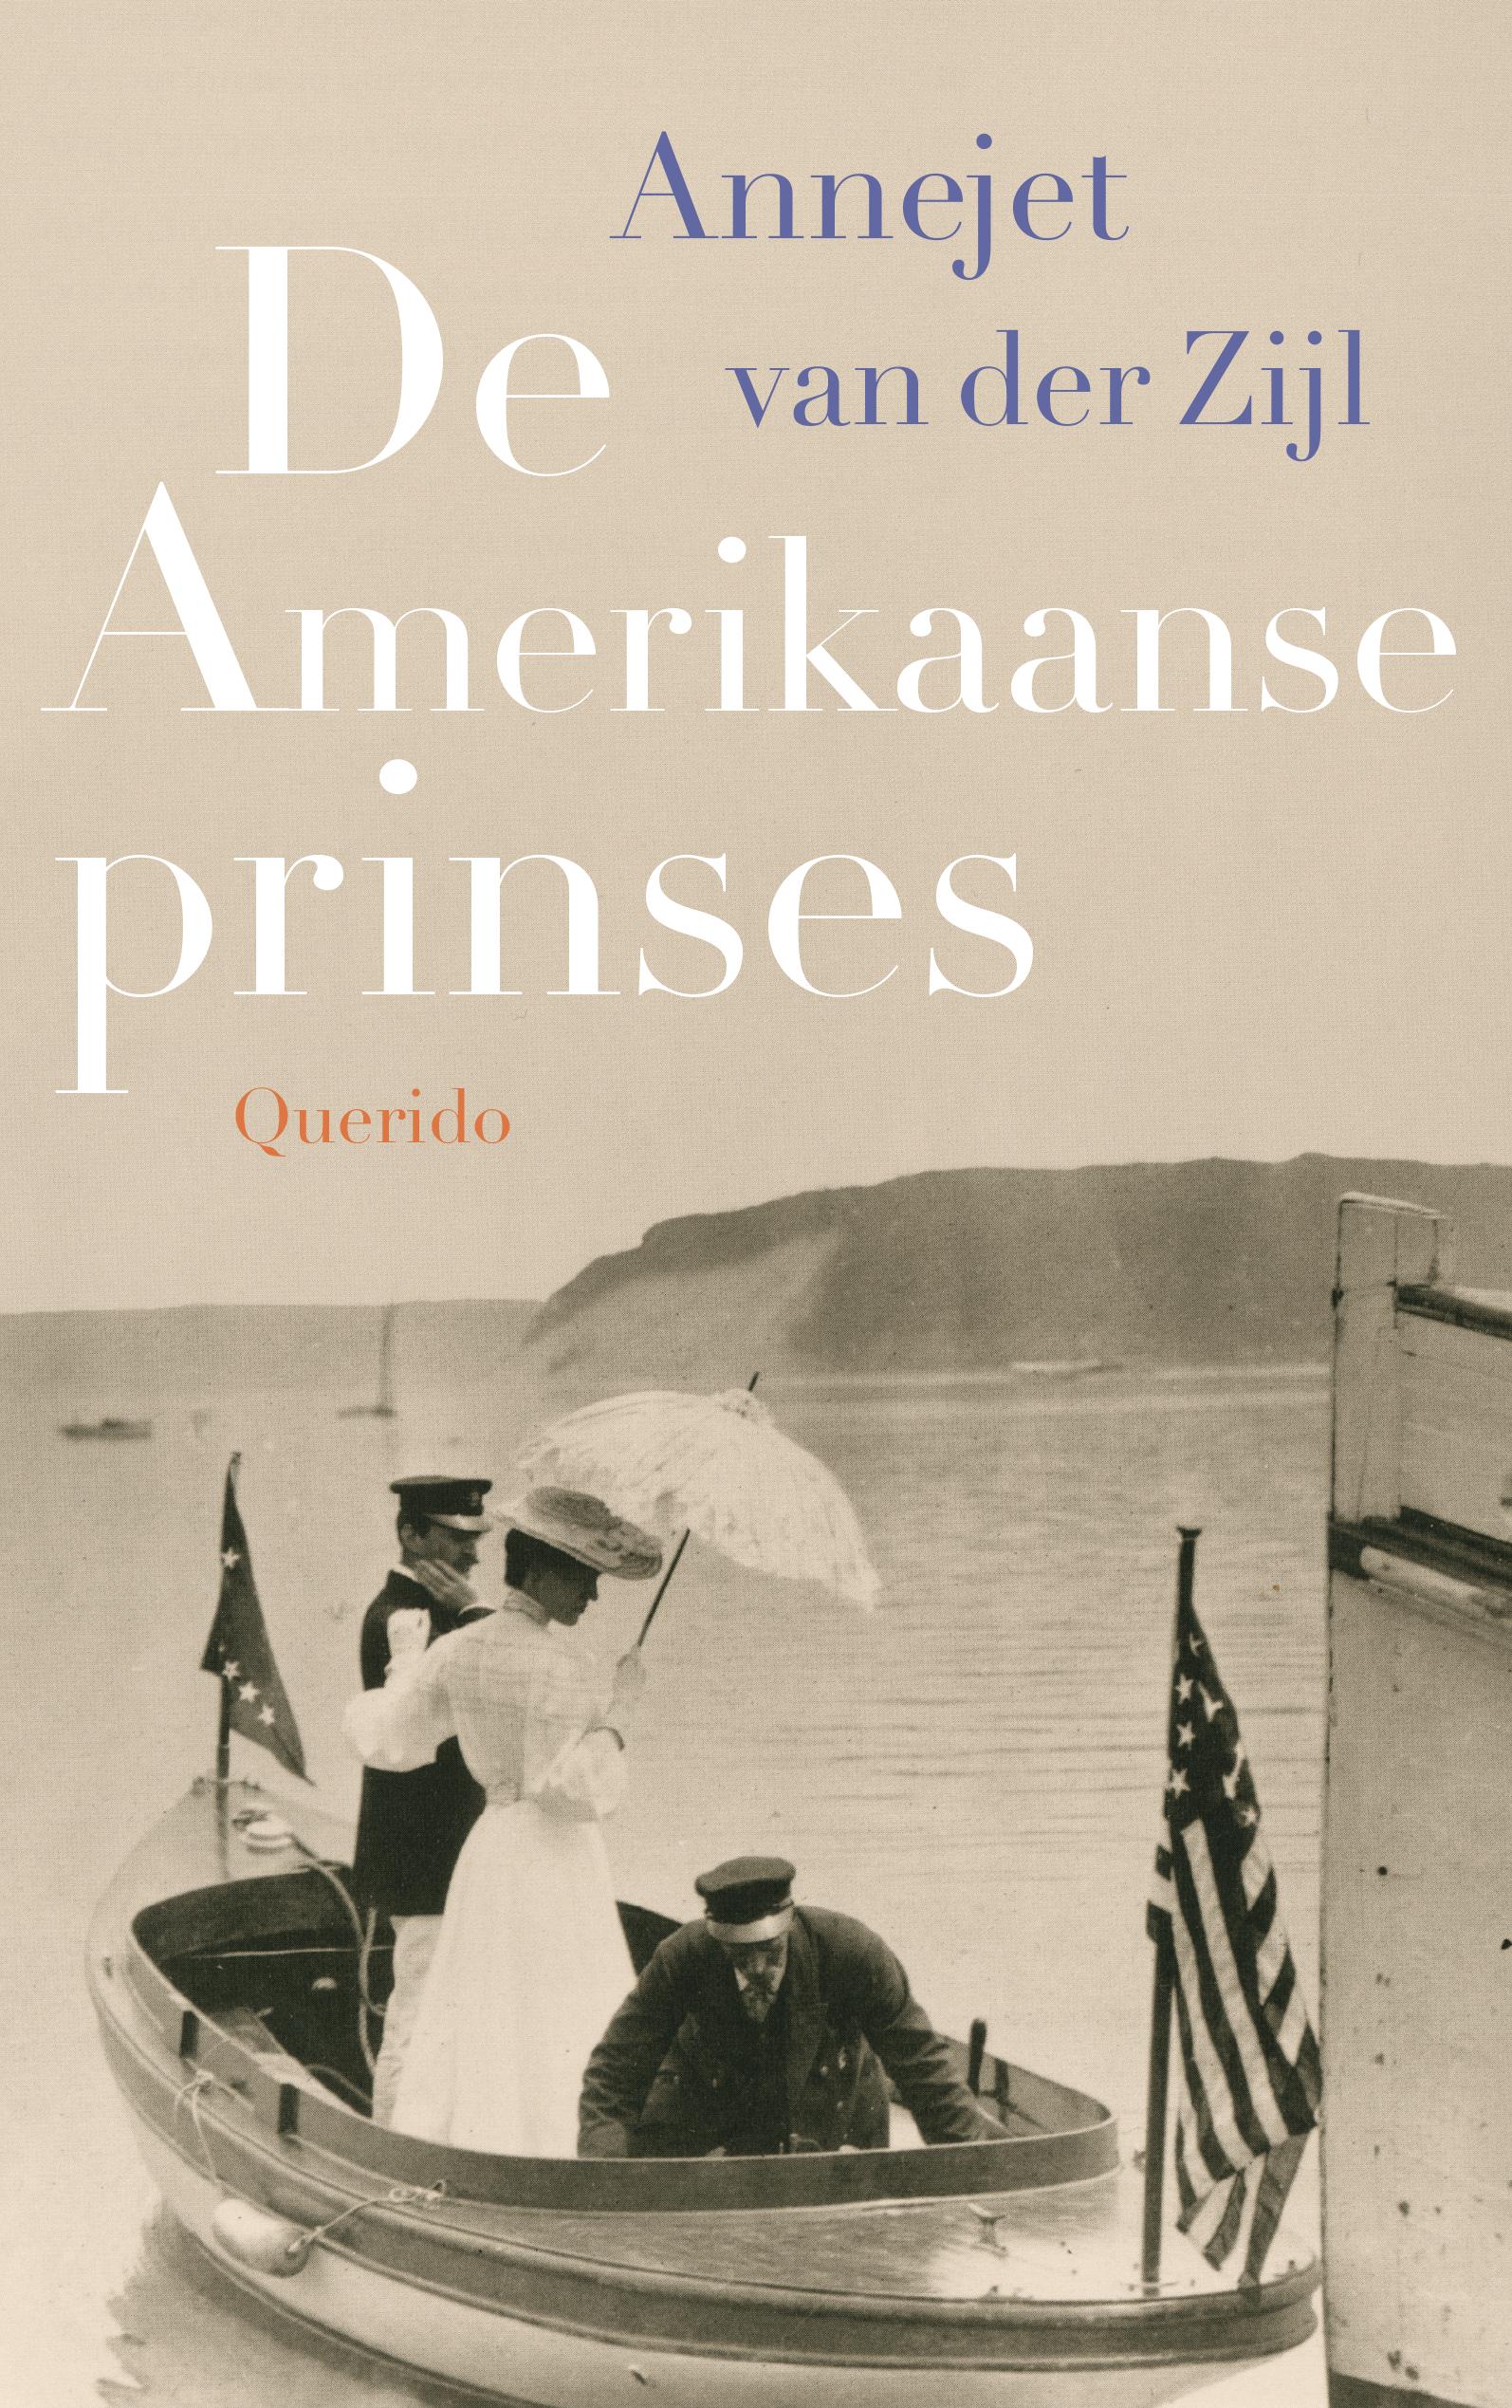 De Amerikaanse prinses  by  Annejet van der Zijl